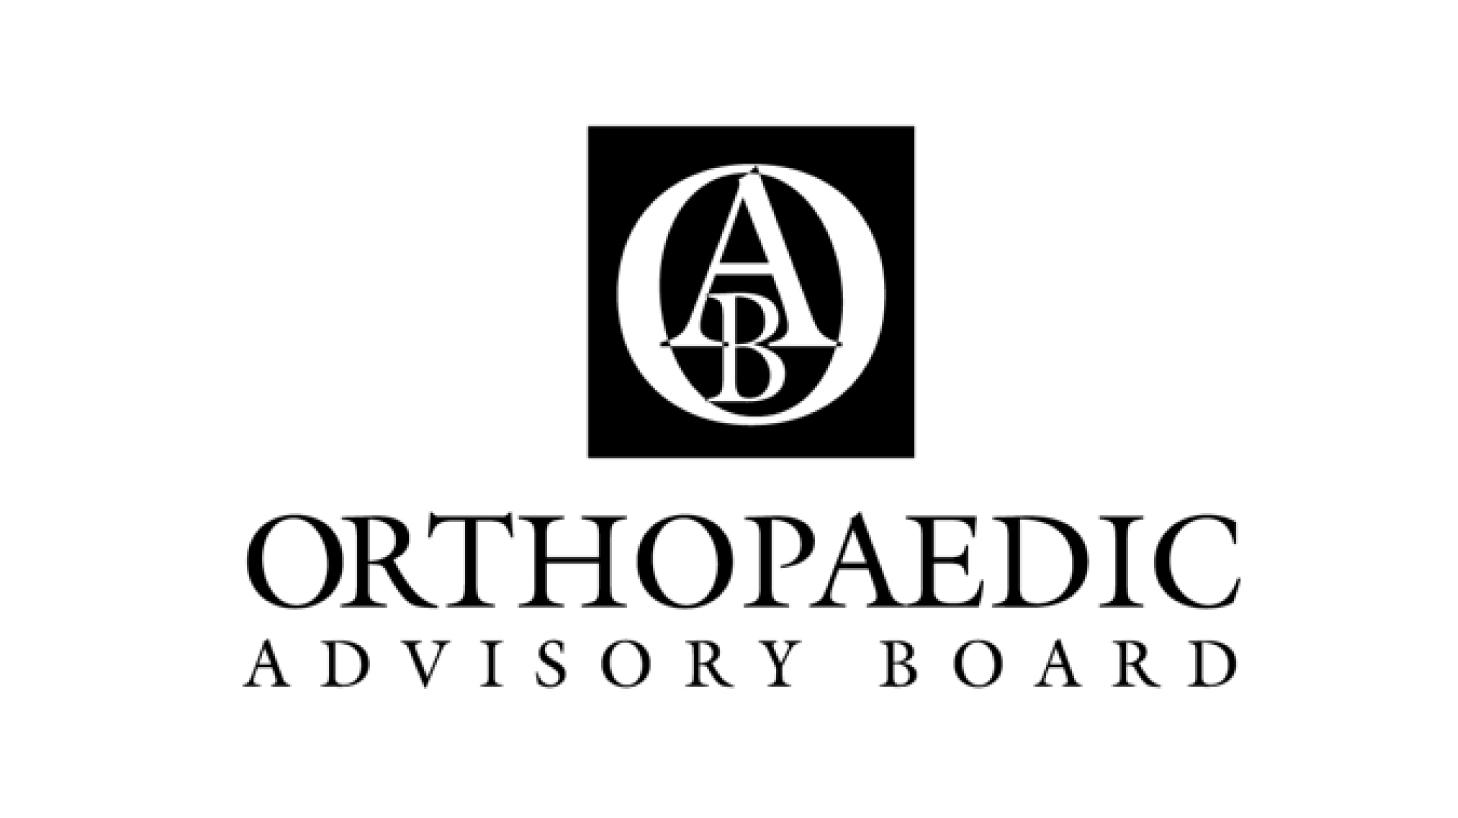 About-us---advisory